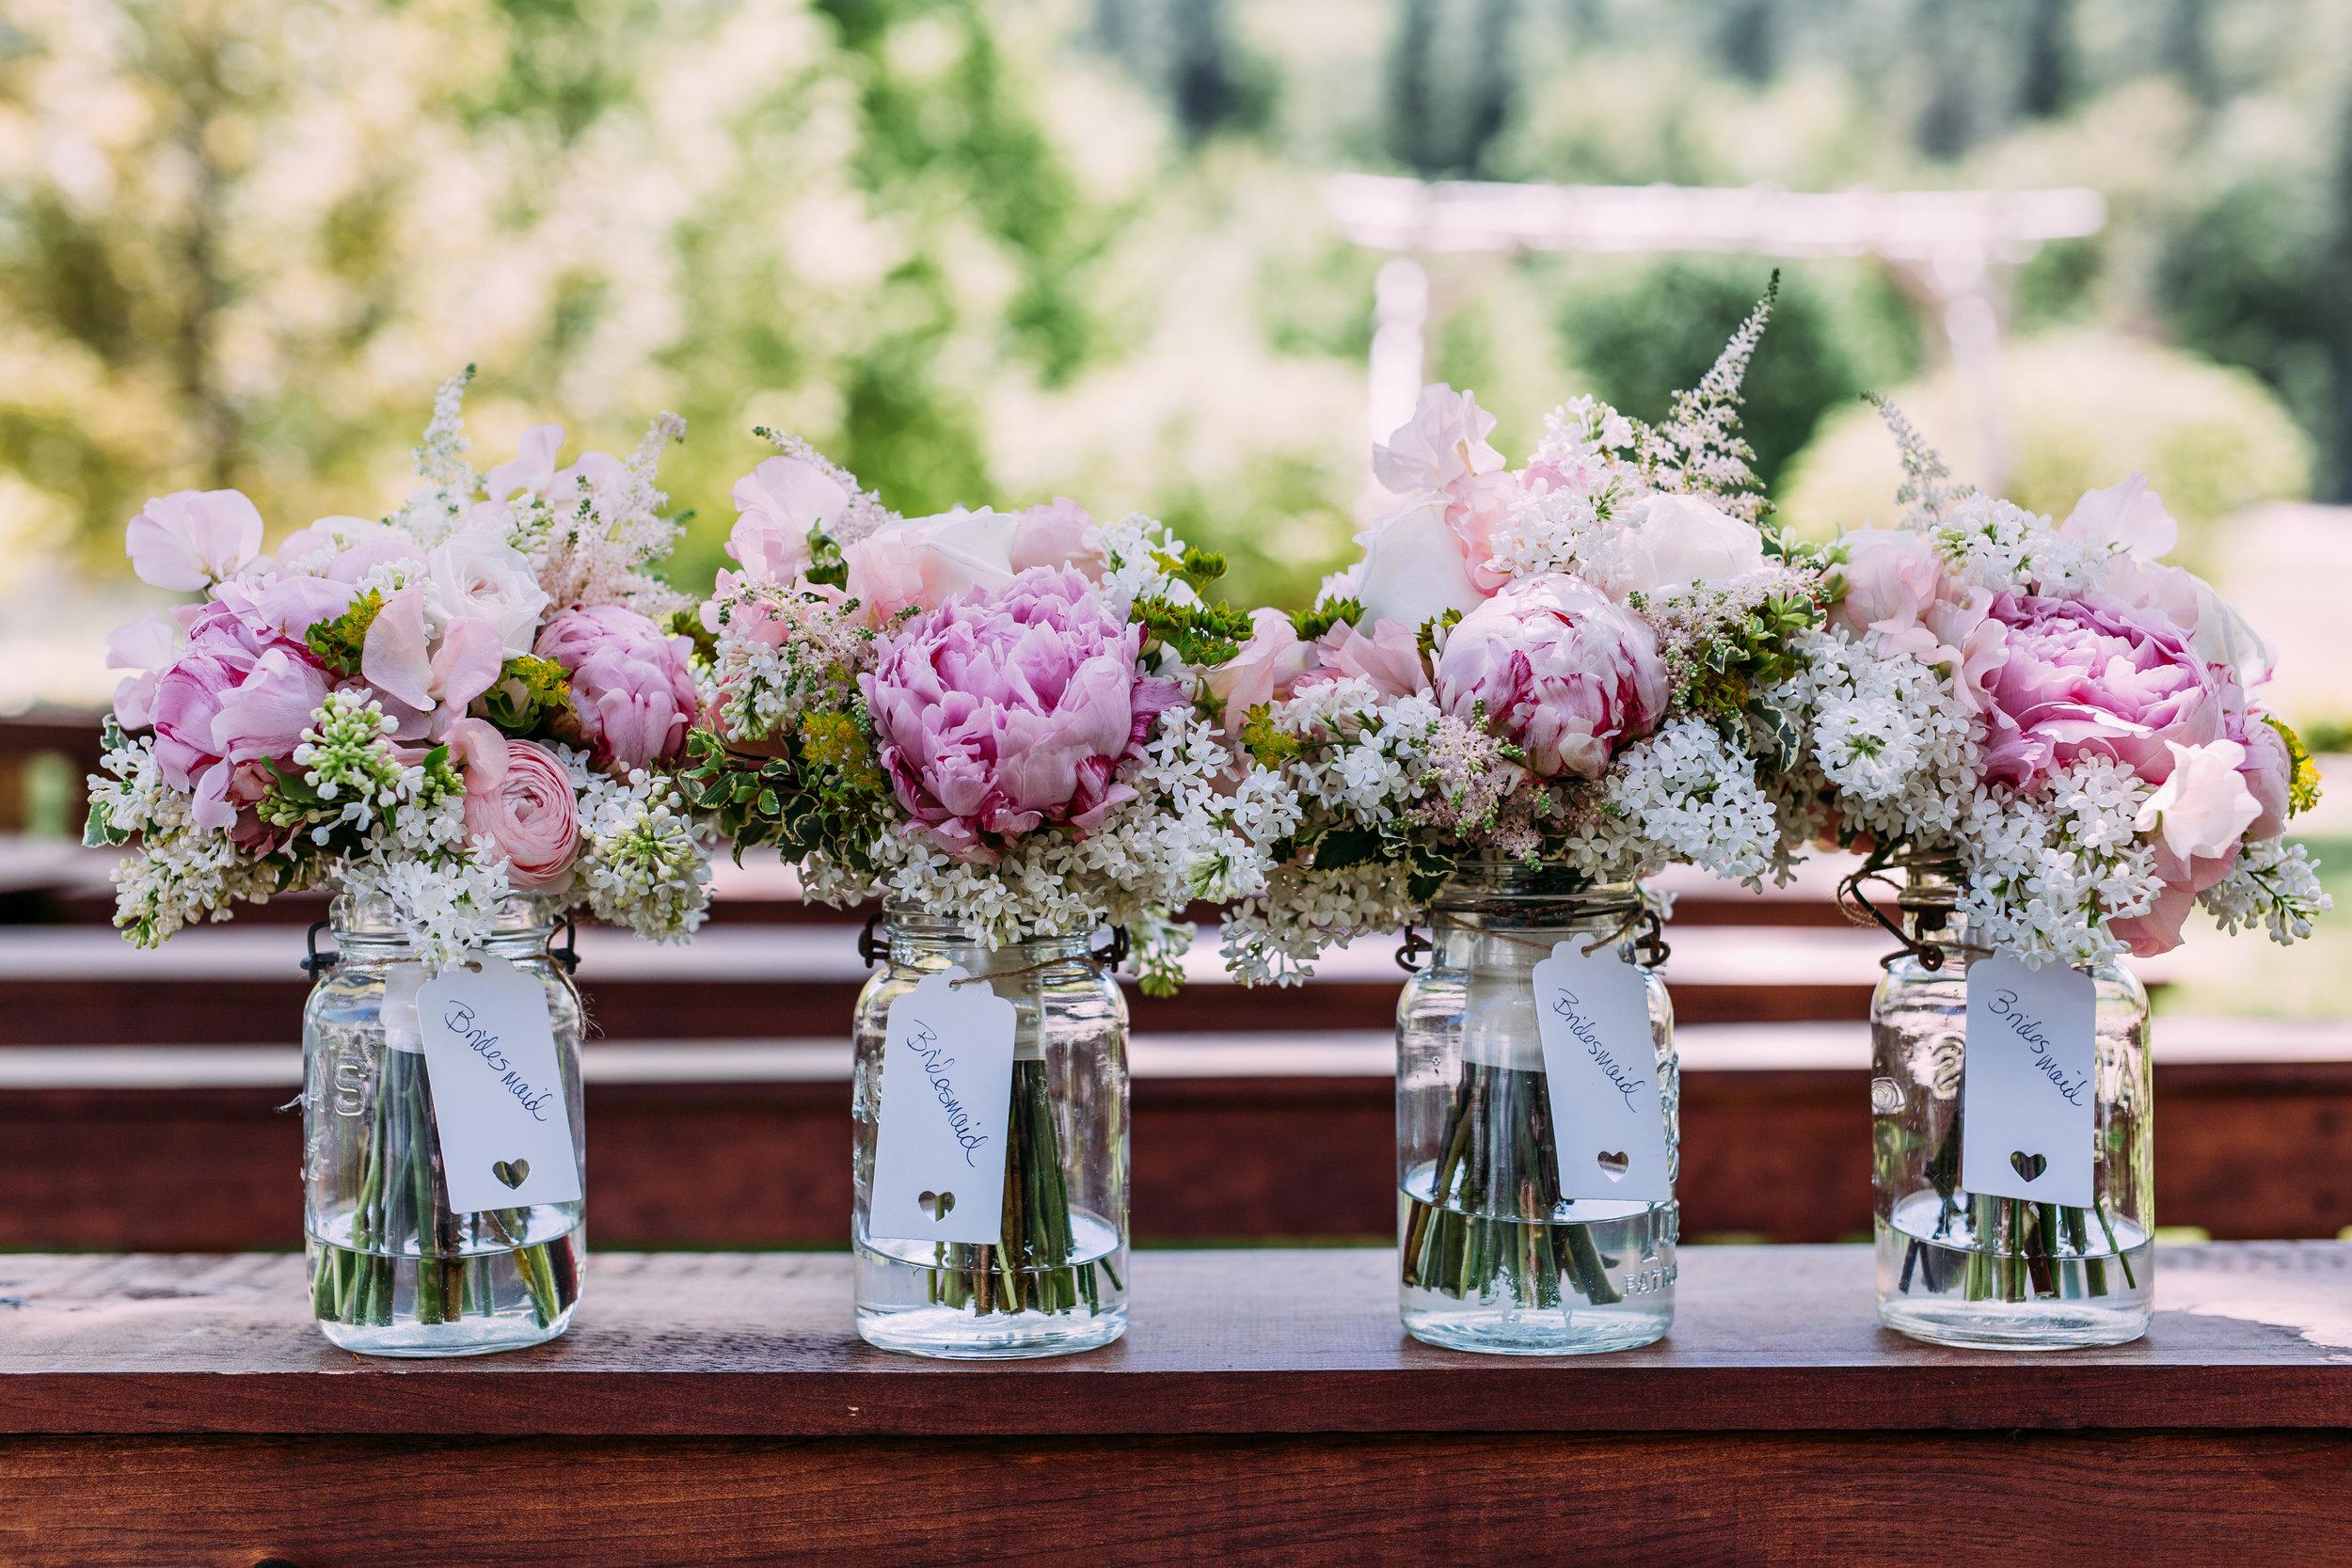 RickSara_Wedding_Morning_PreCeremony-86.jpg